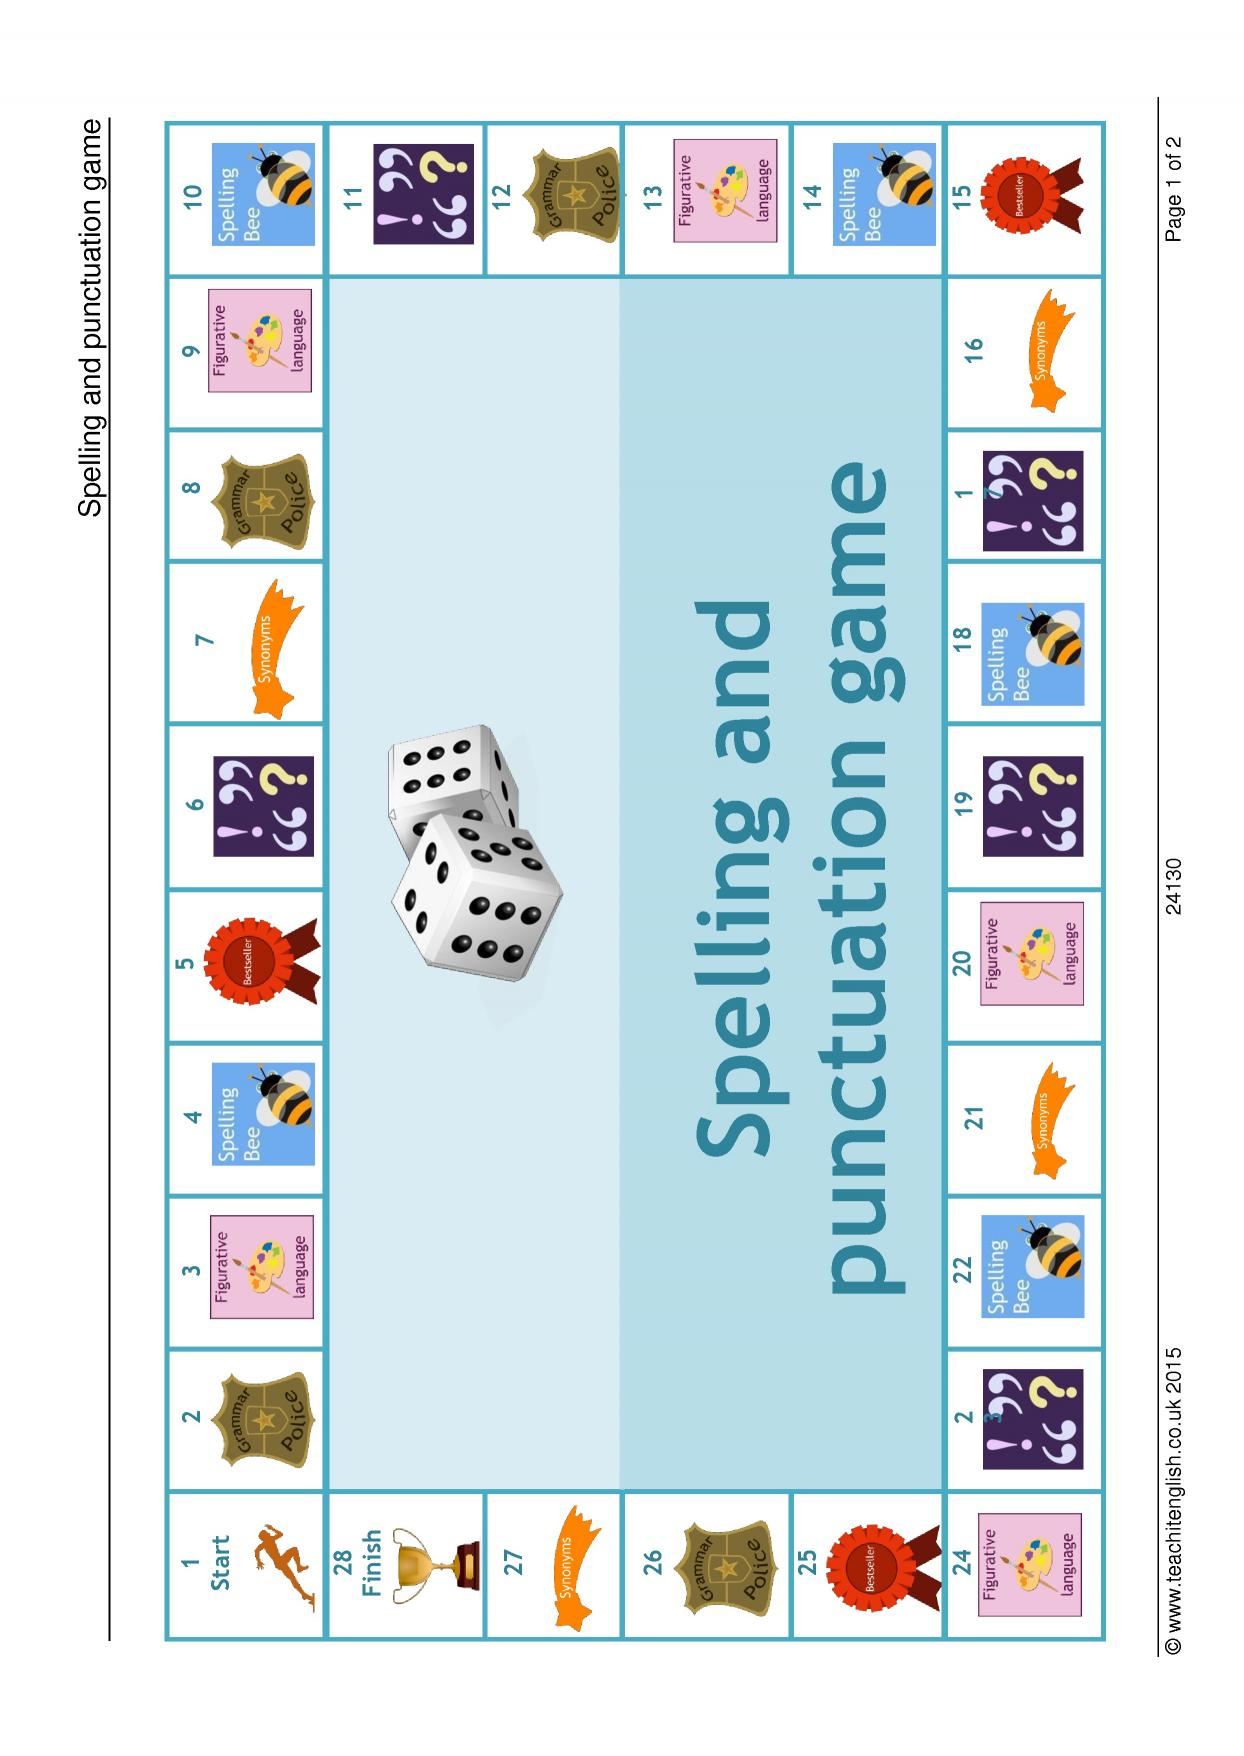 KS3 Grammar and vocabulary | Word games | Teachit English